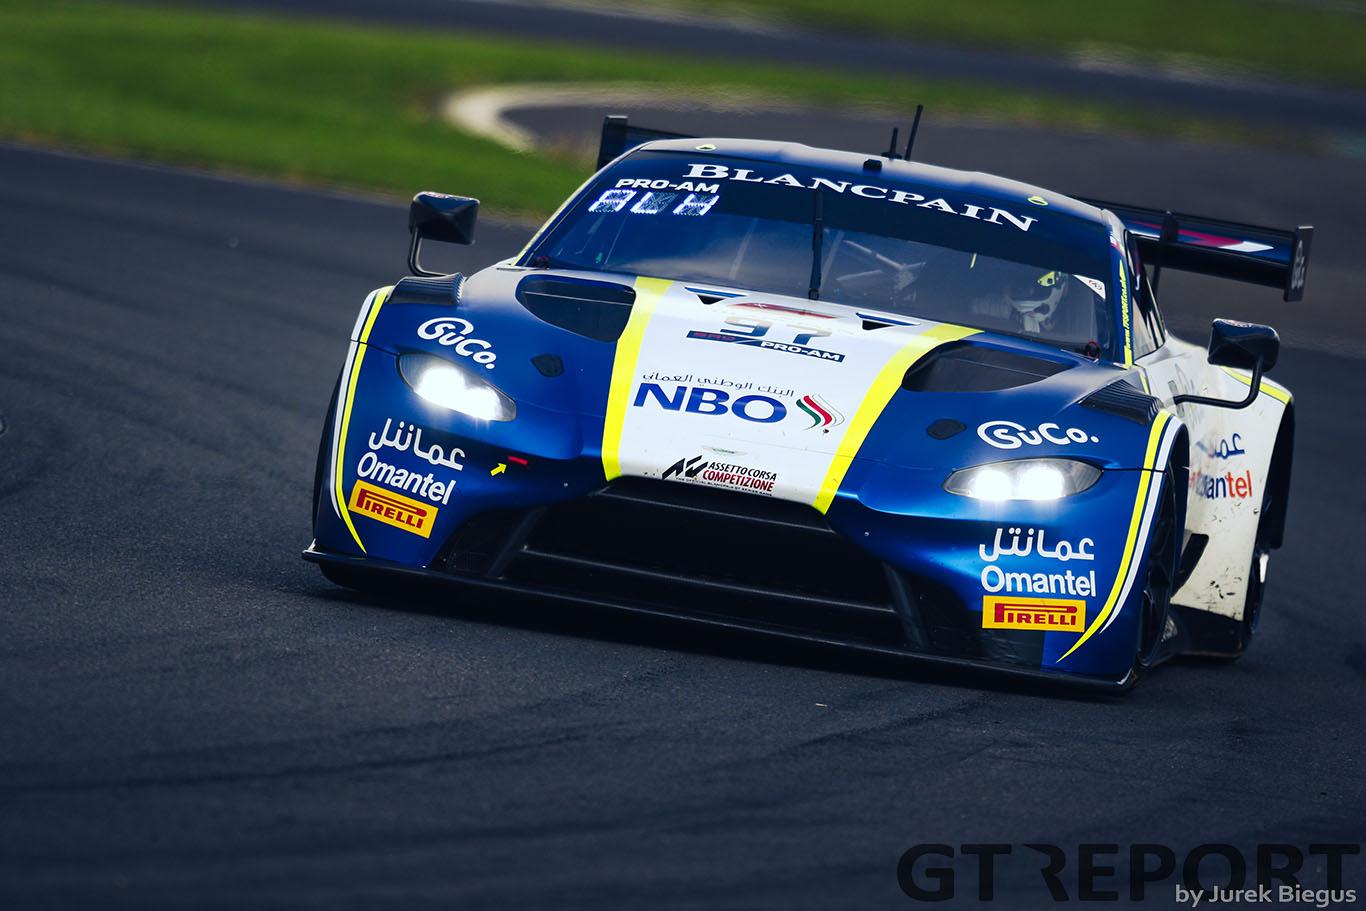 Ahmad Al Harthy & Oman Racing join British GT at Snetterton